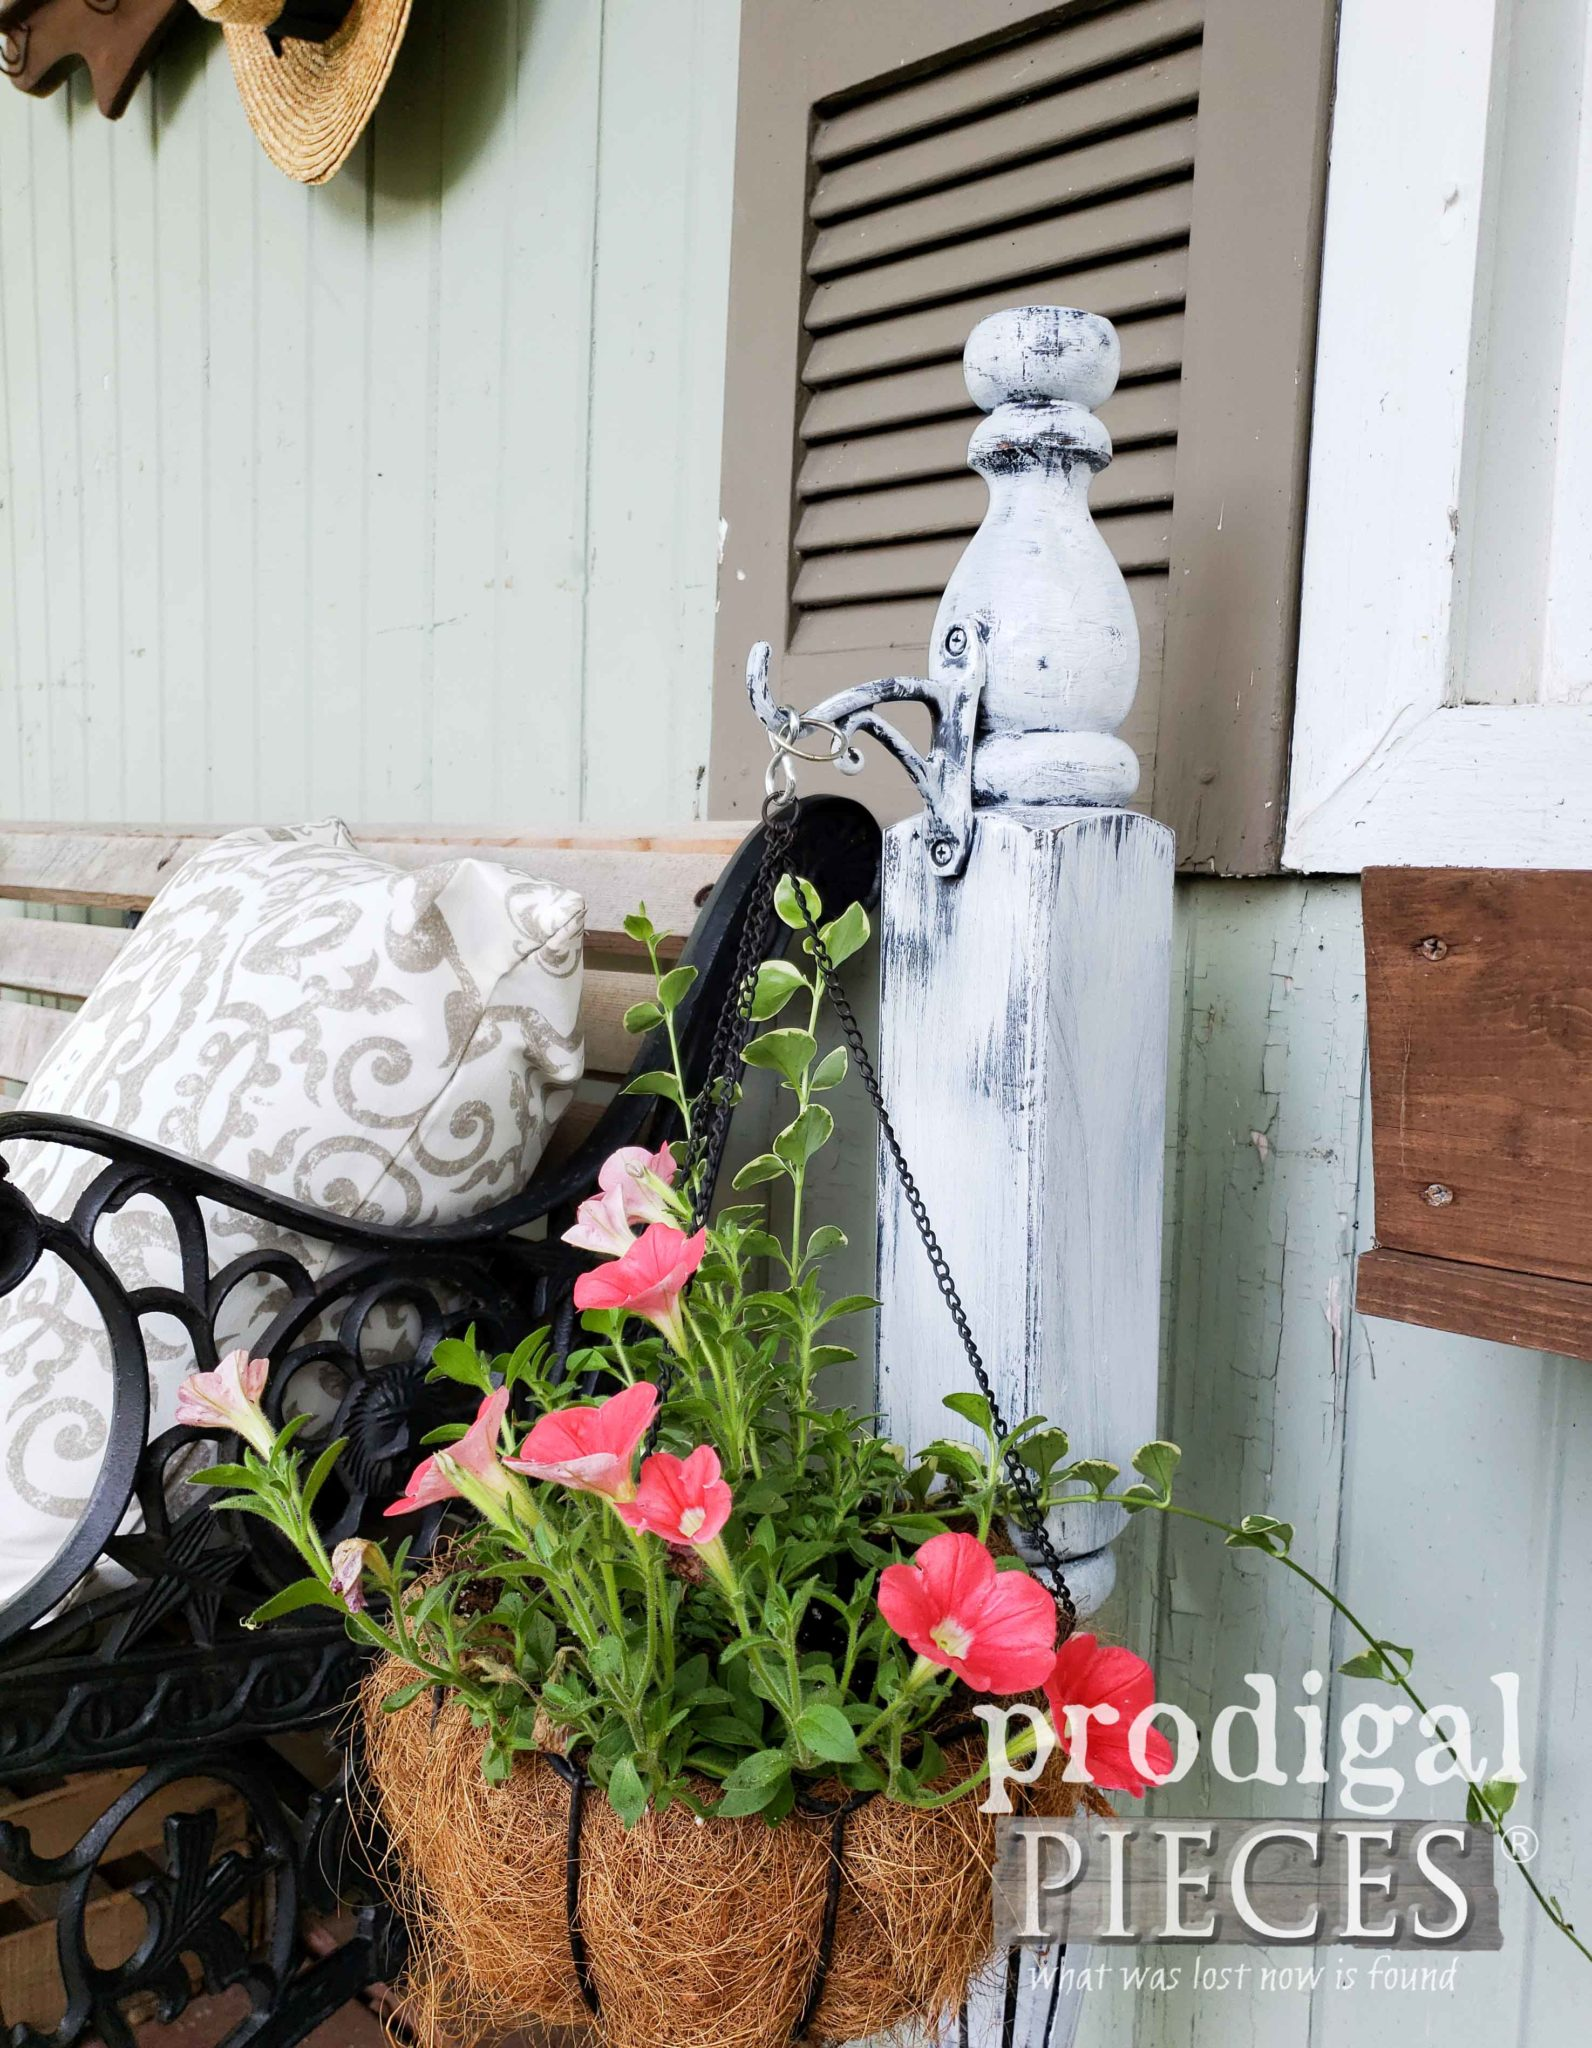 Upcycled Bed Post Plant Hanger DIY Tutorial by Larissa of Prodigal Pieces | prodigalpieces.com #prodigalpieces #diy #home #handmade #garden #homedecor